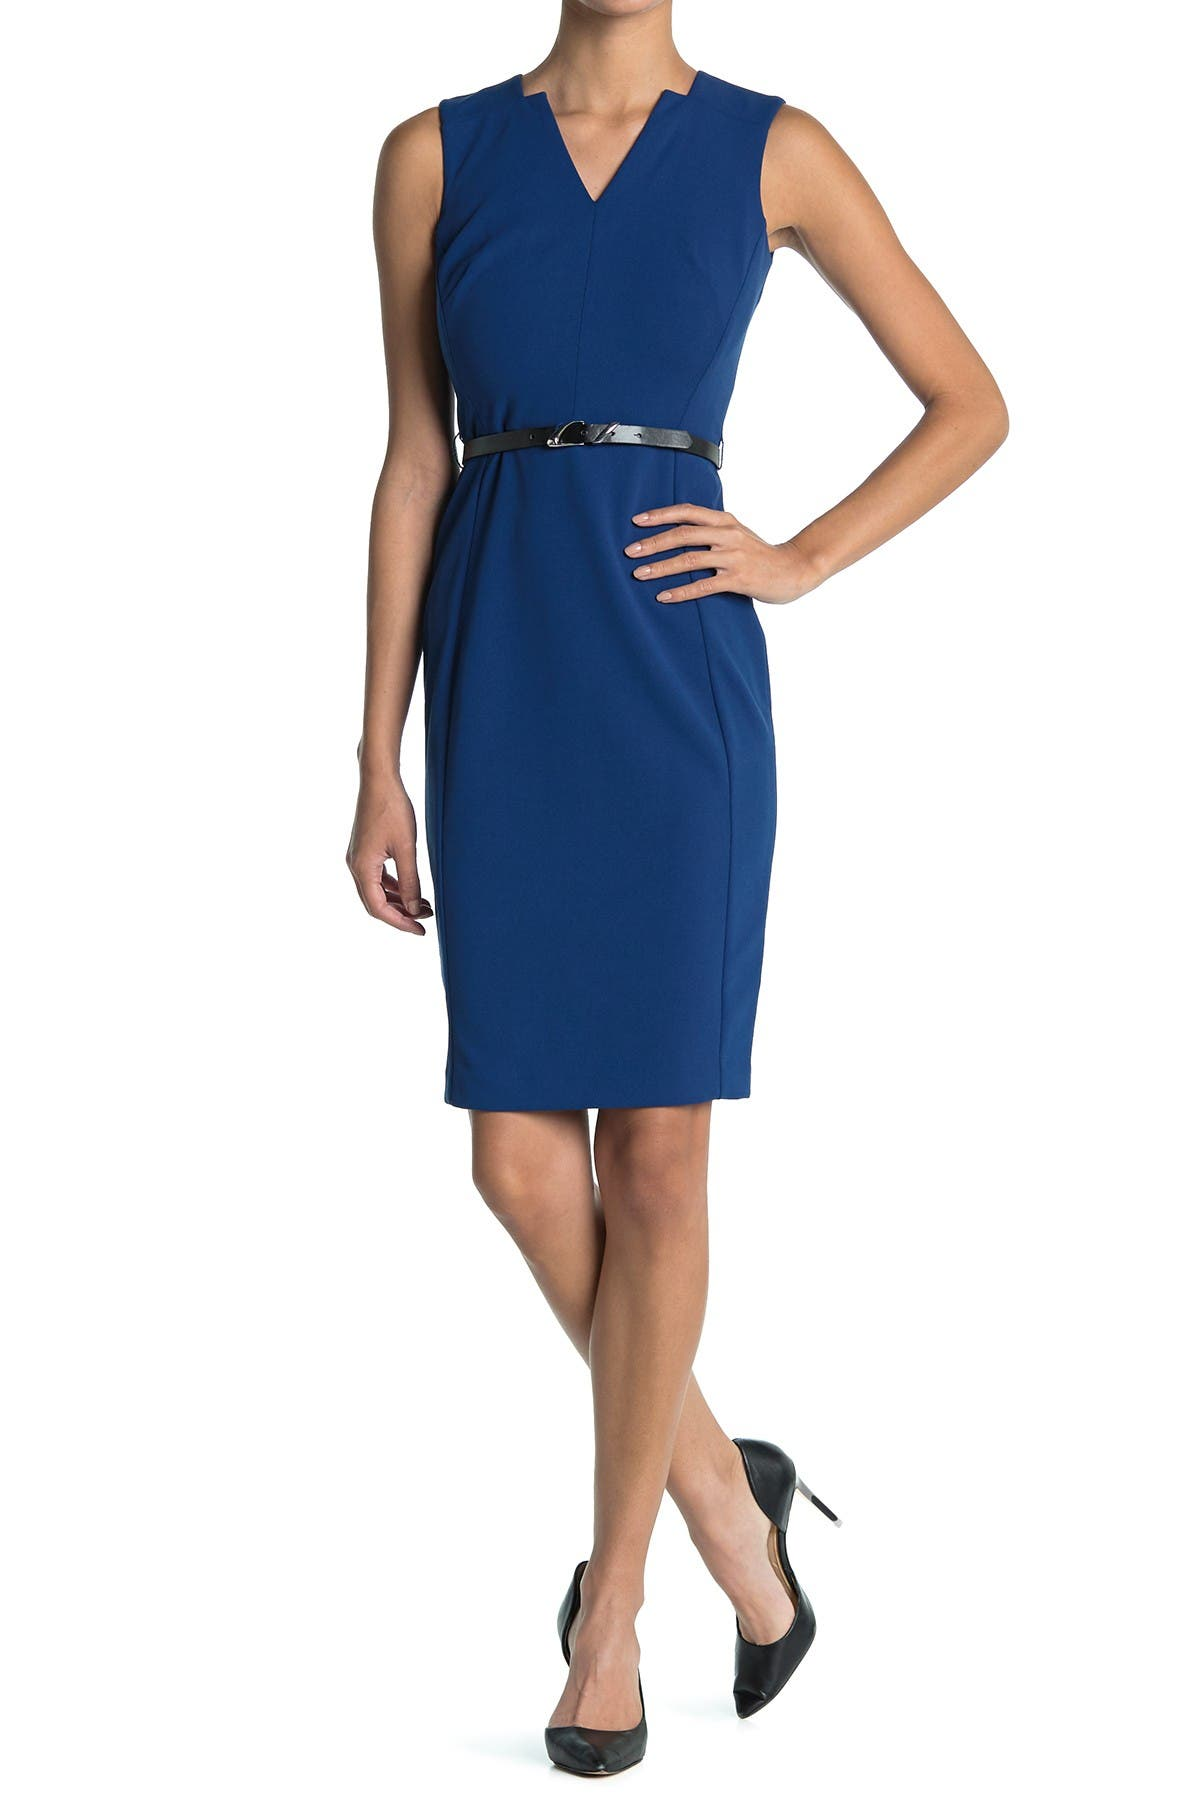 Image of Calvin Klein Sleeveless Belted Sheath Dress